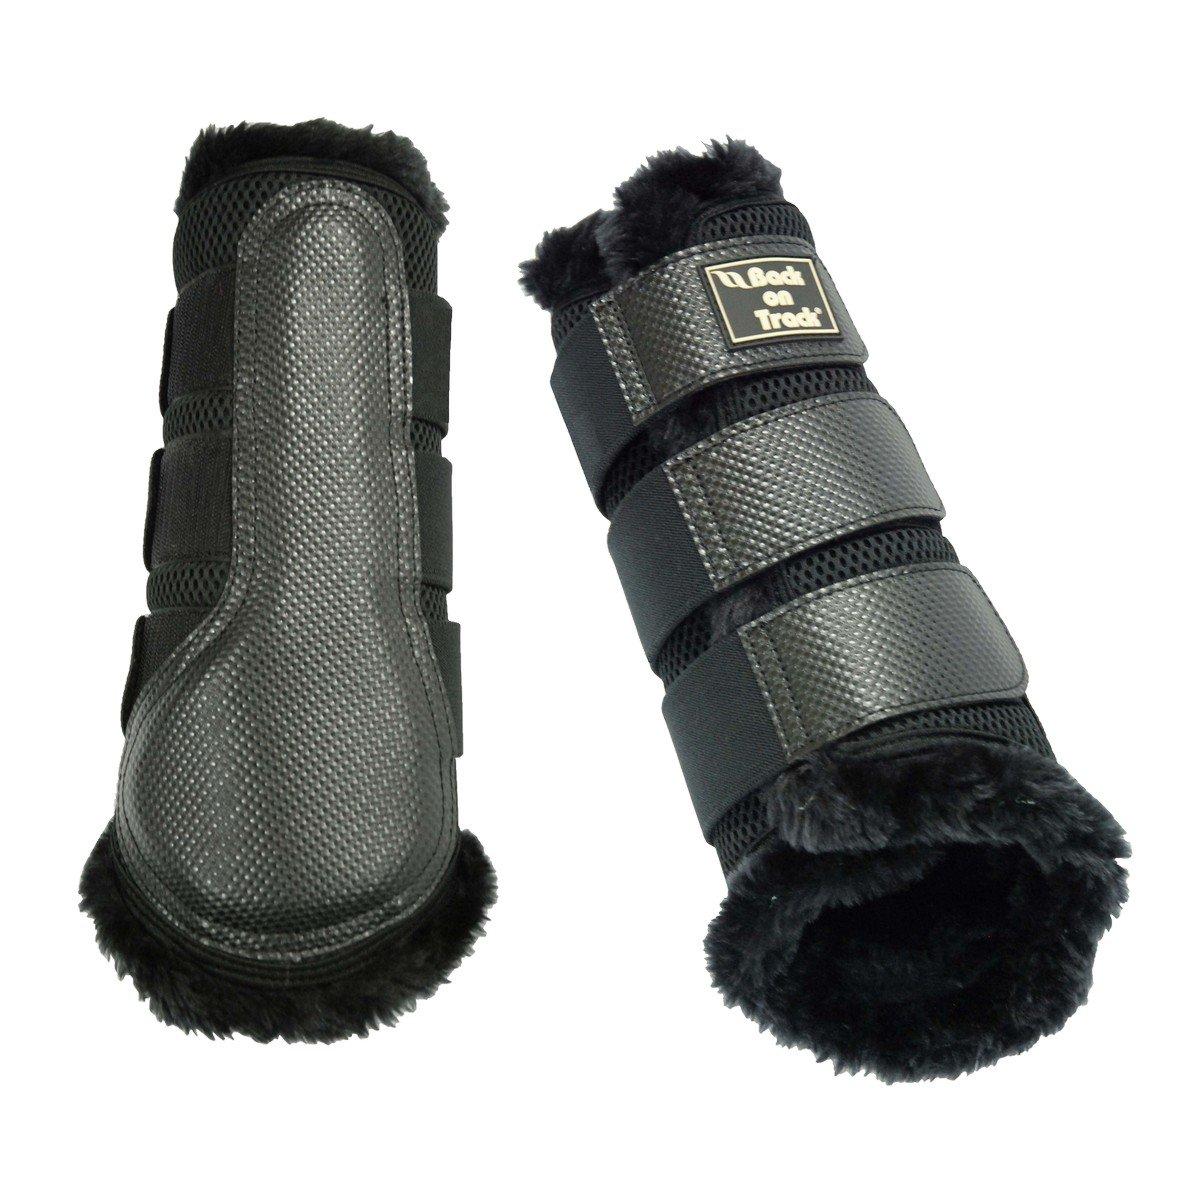 Afbeelding van Back on Track Brush Boot 3D Mesh Voering Zwart L